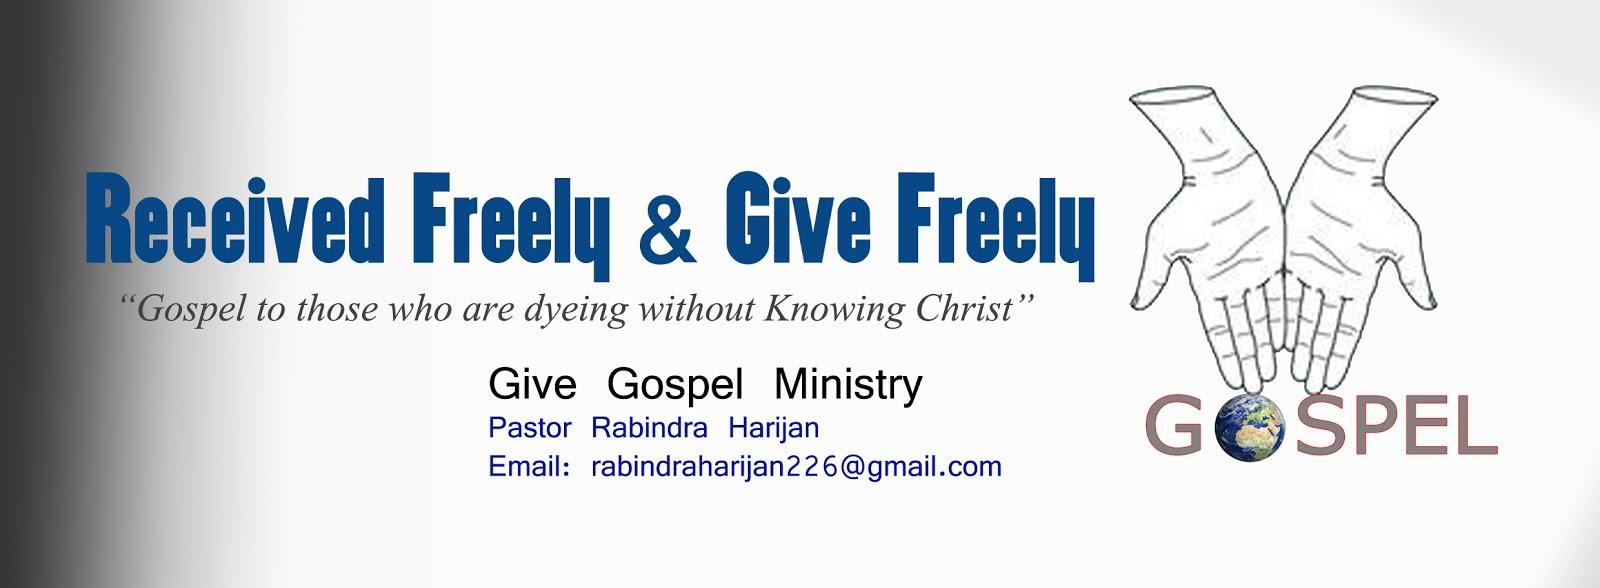 GIVE GOSPEL MINISTRY - Nepal.